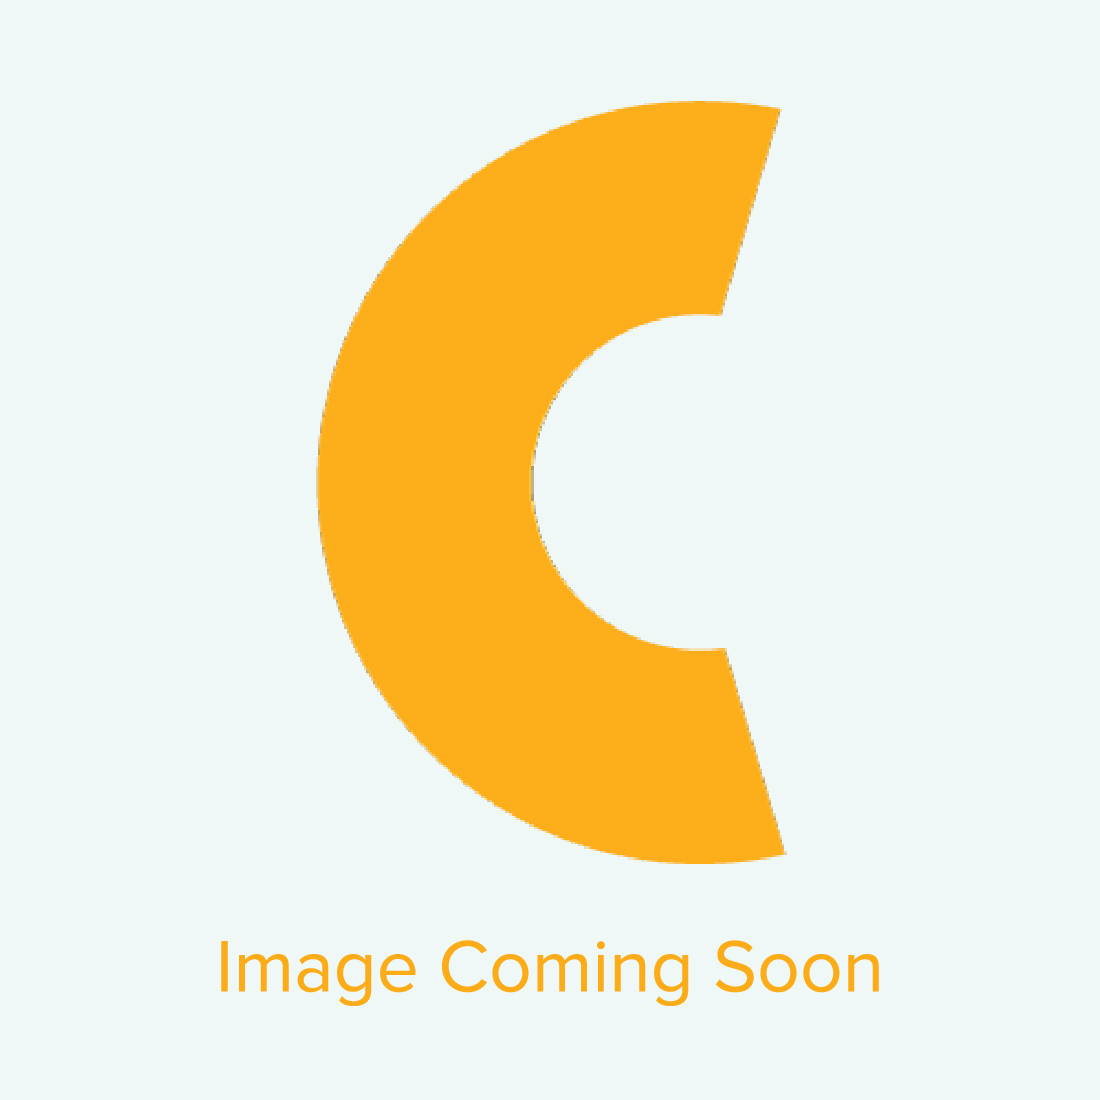 Blade Holder for FC2250 Graphtec Vinyl Cutter